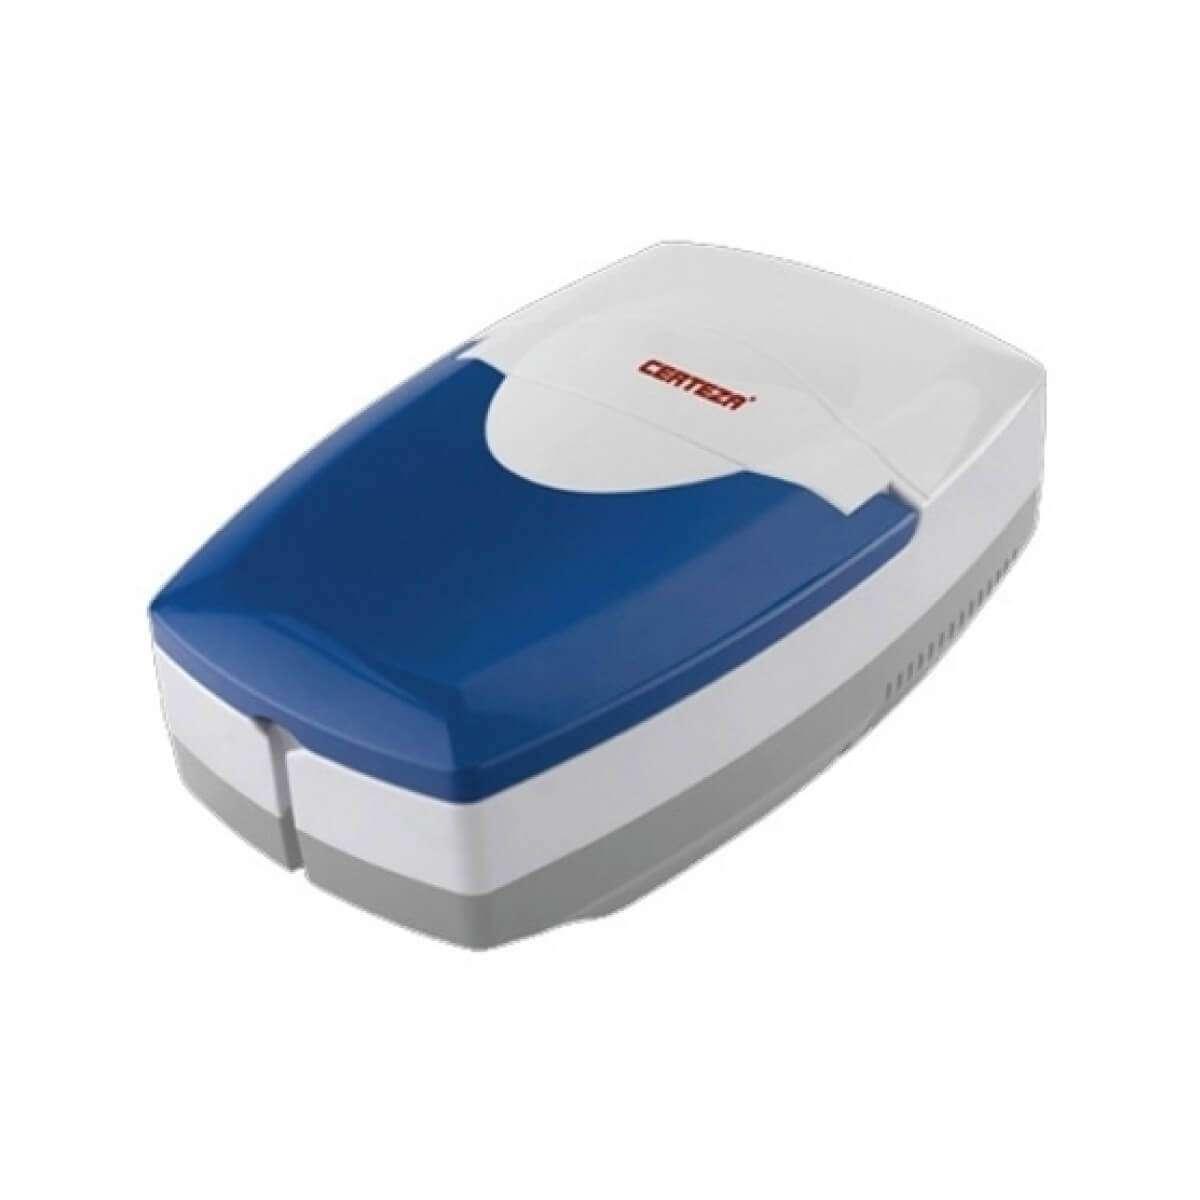 Buy Nebulizer machine online in pakistan